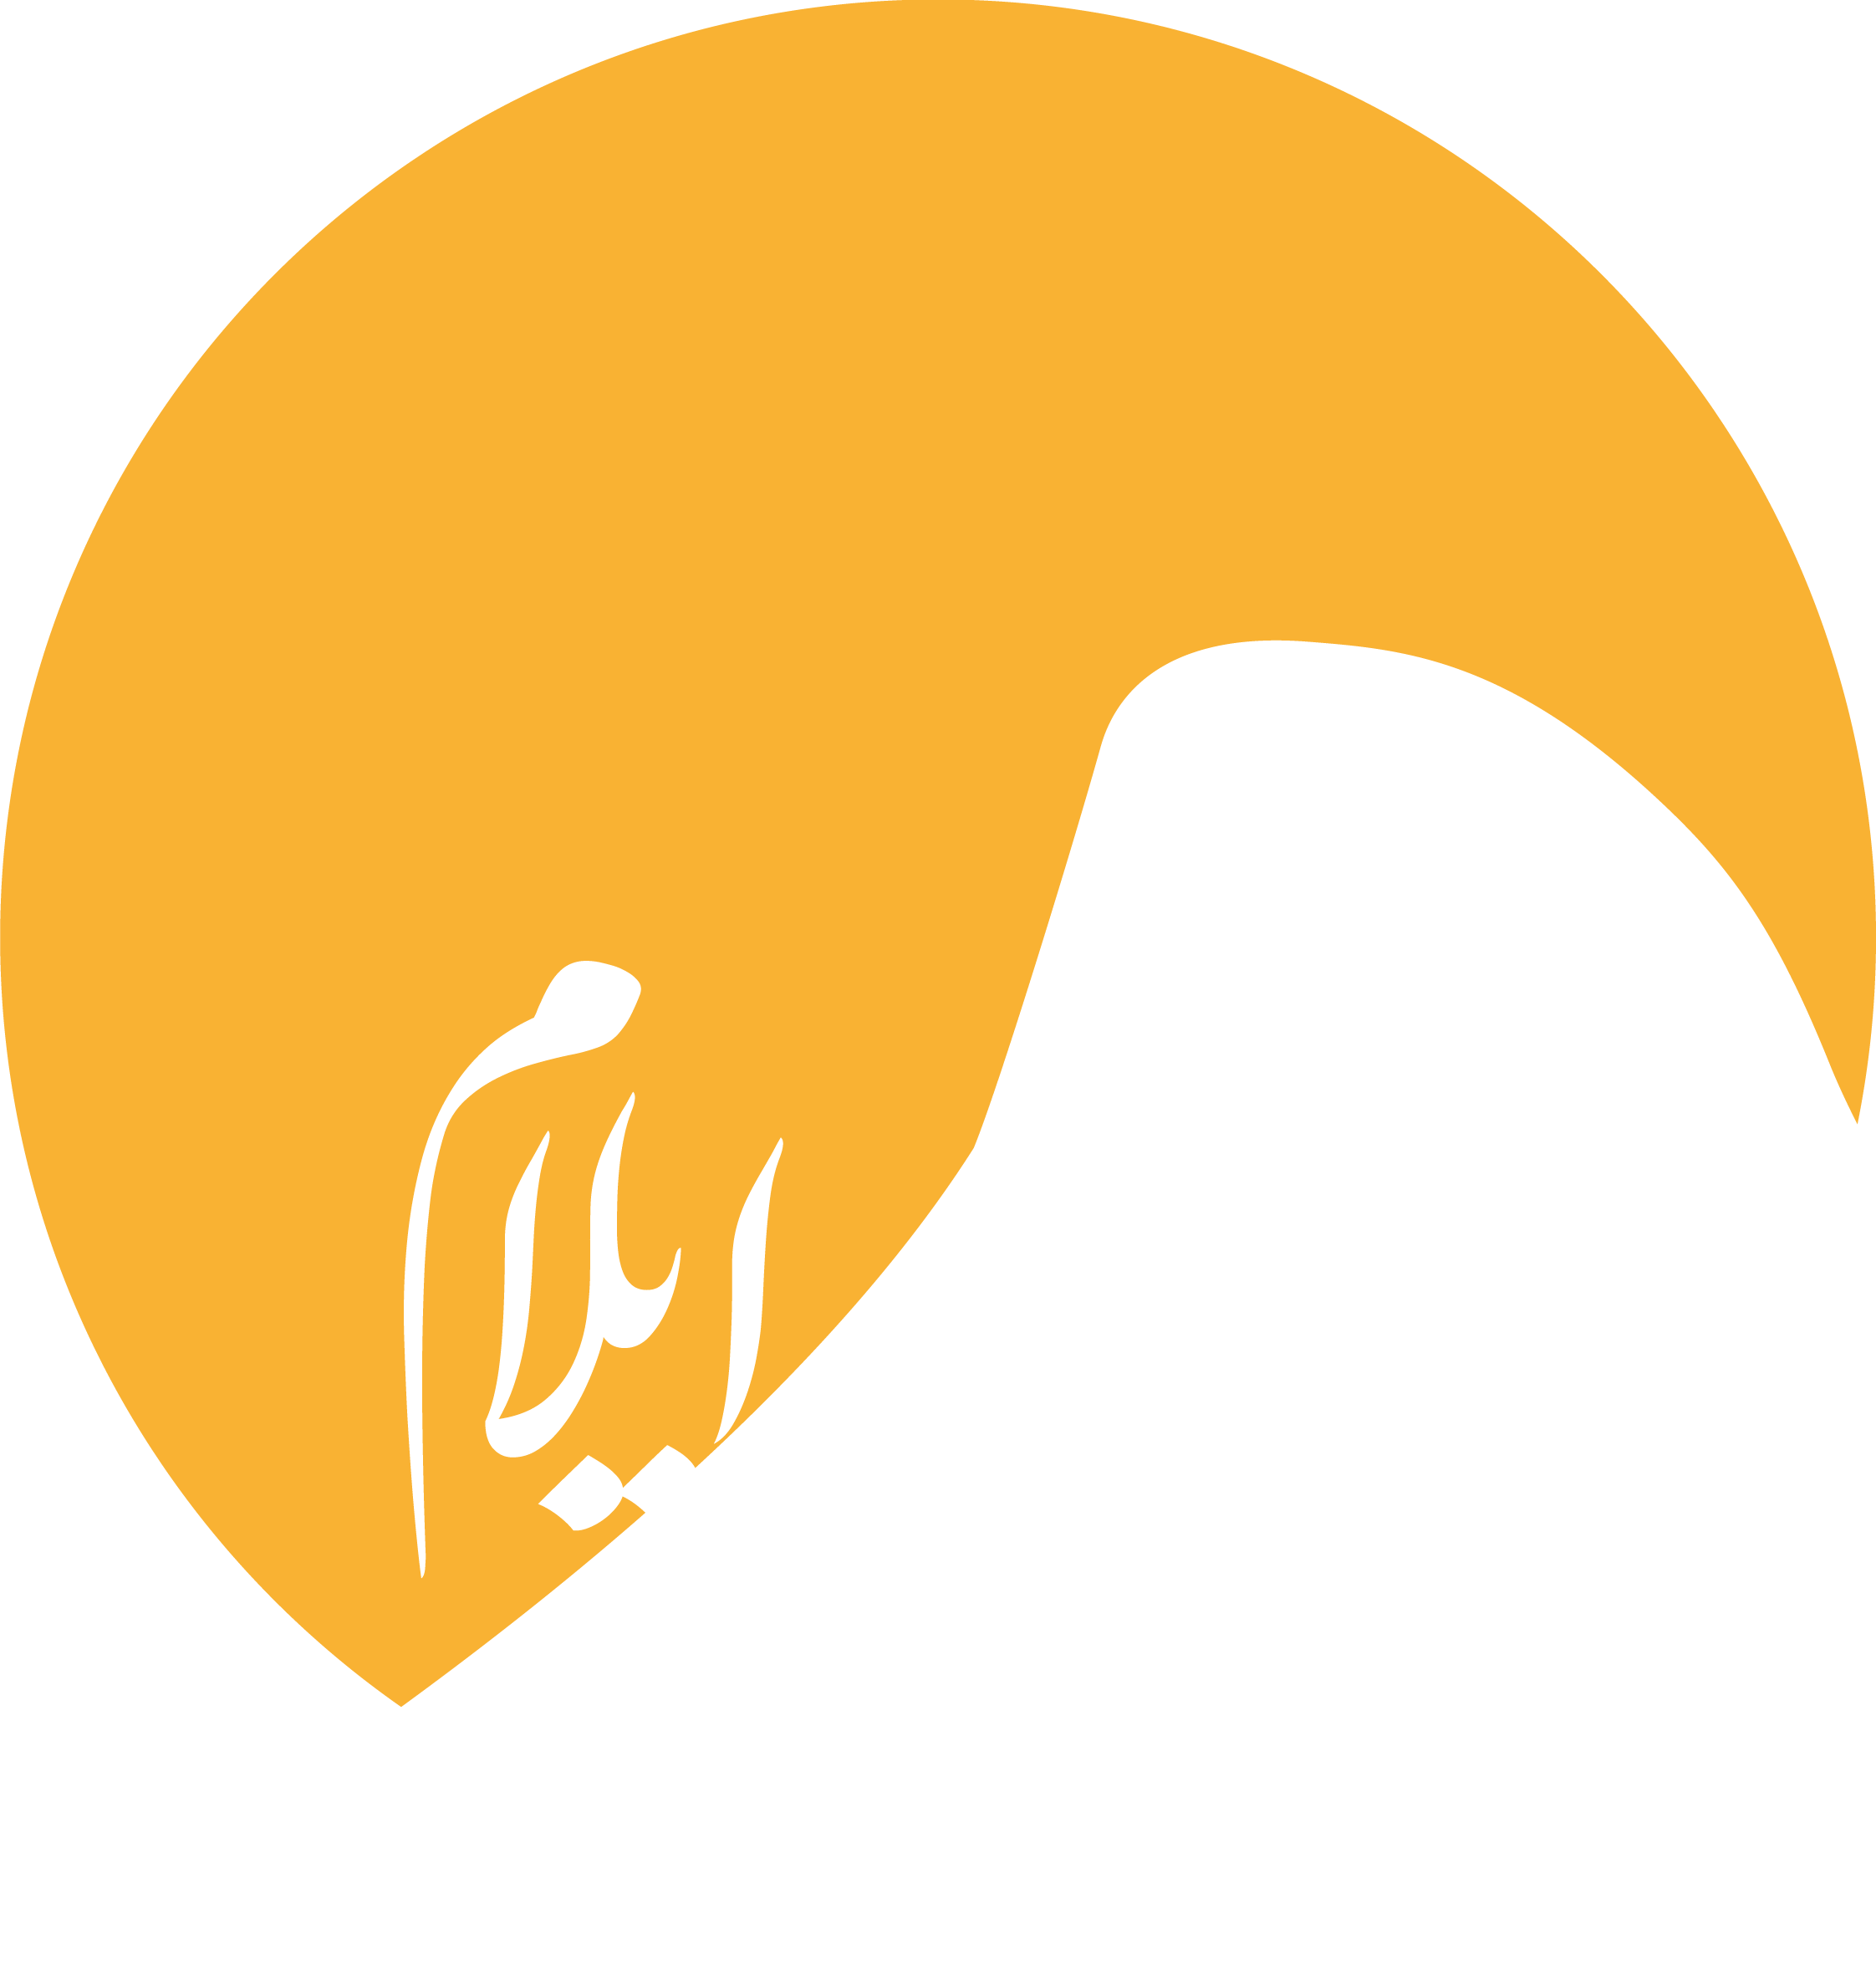 ژیار ایلام